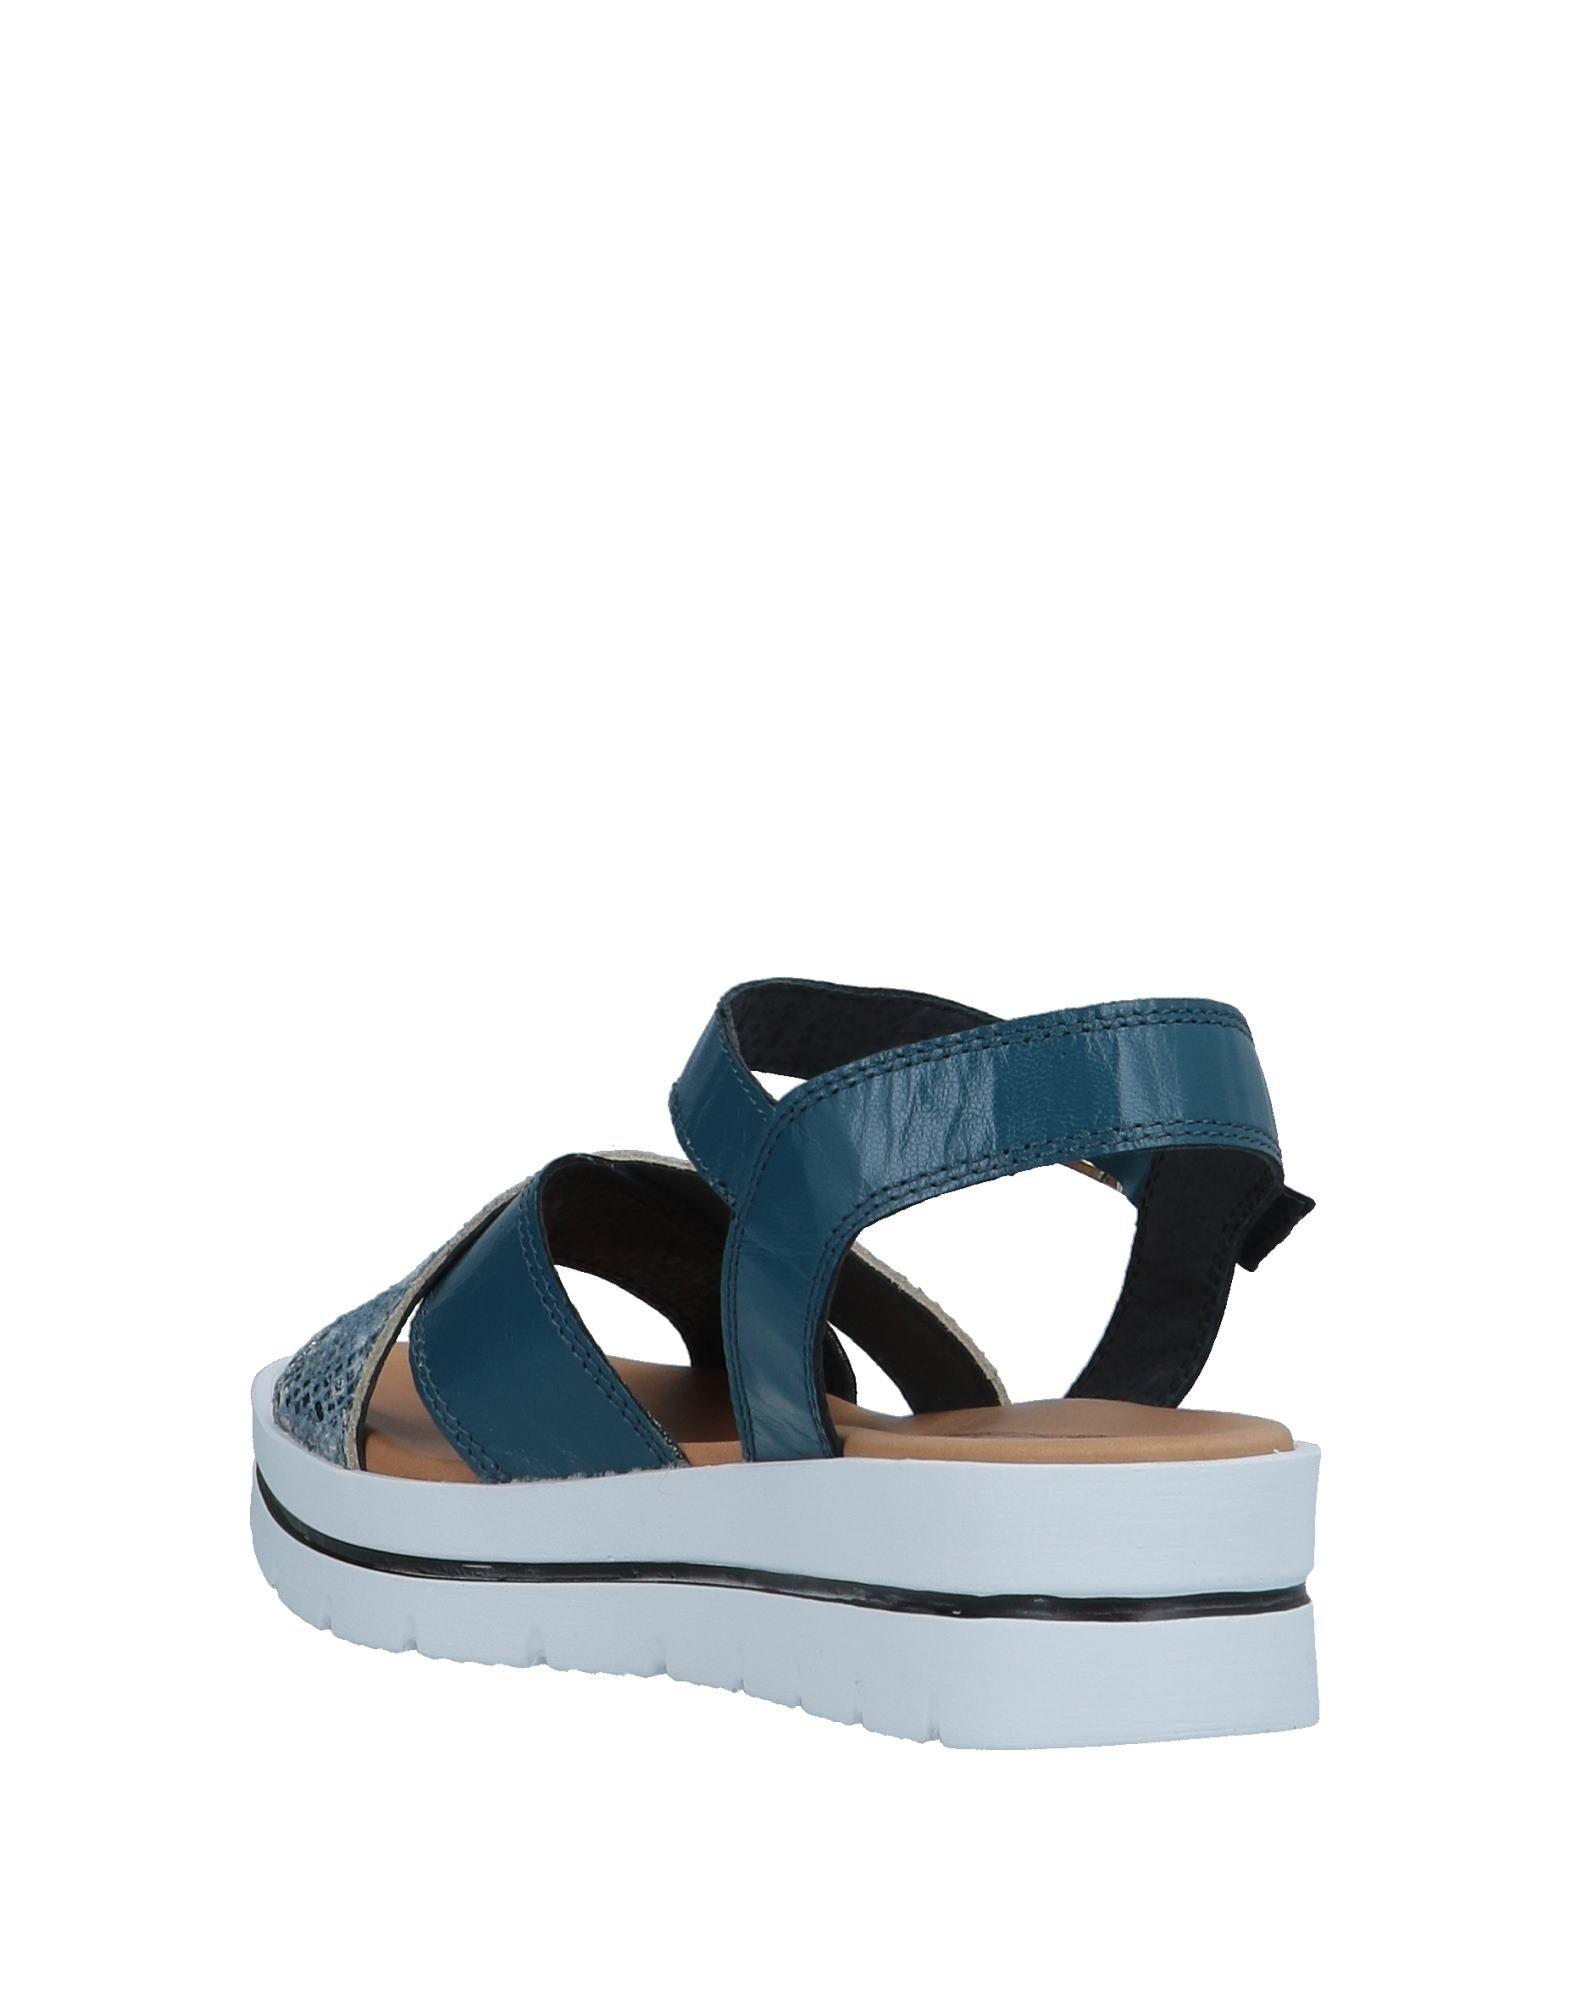 piampiani sandales canada - femmes piampiani sandales en ligne sur canada sandales - 11571259tg efed72